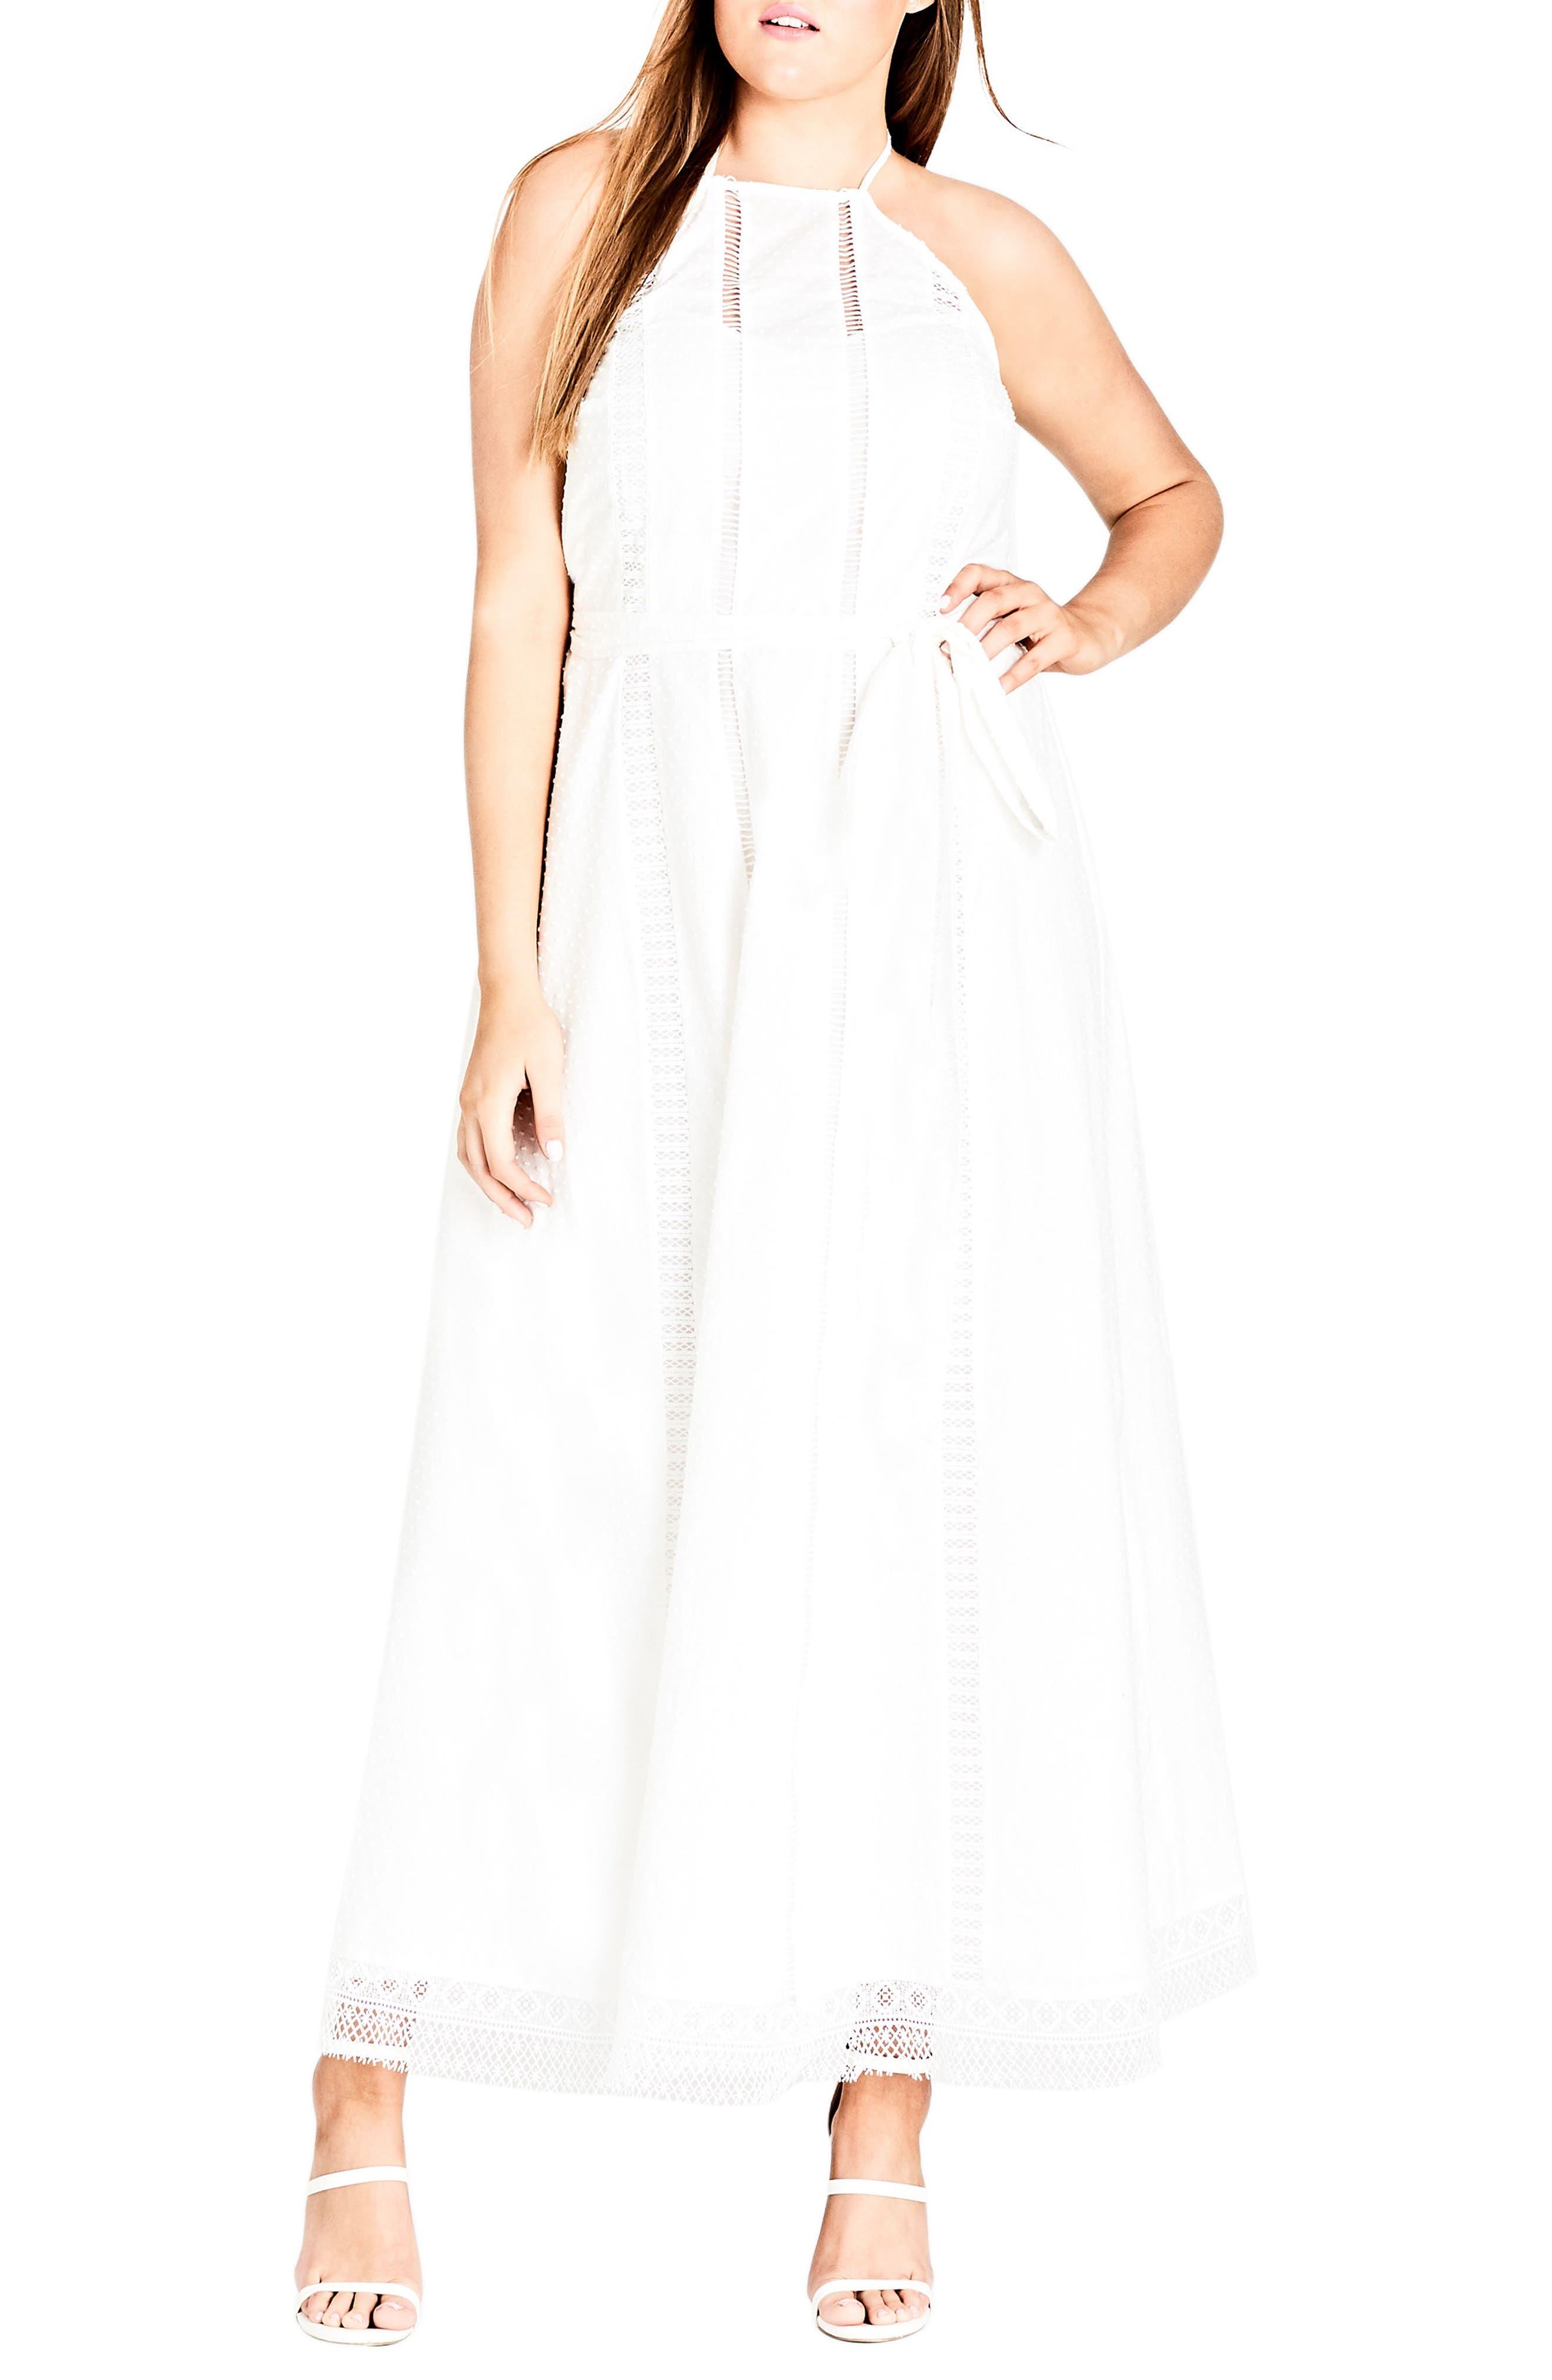 Plus Size City Chic Lace Trim Swiss Dot Halter Maxi Dress, Ivory